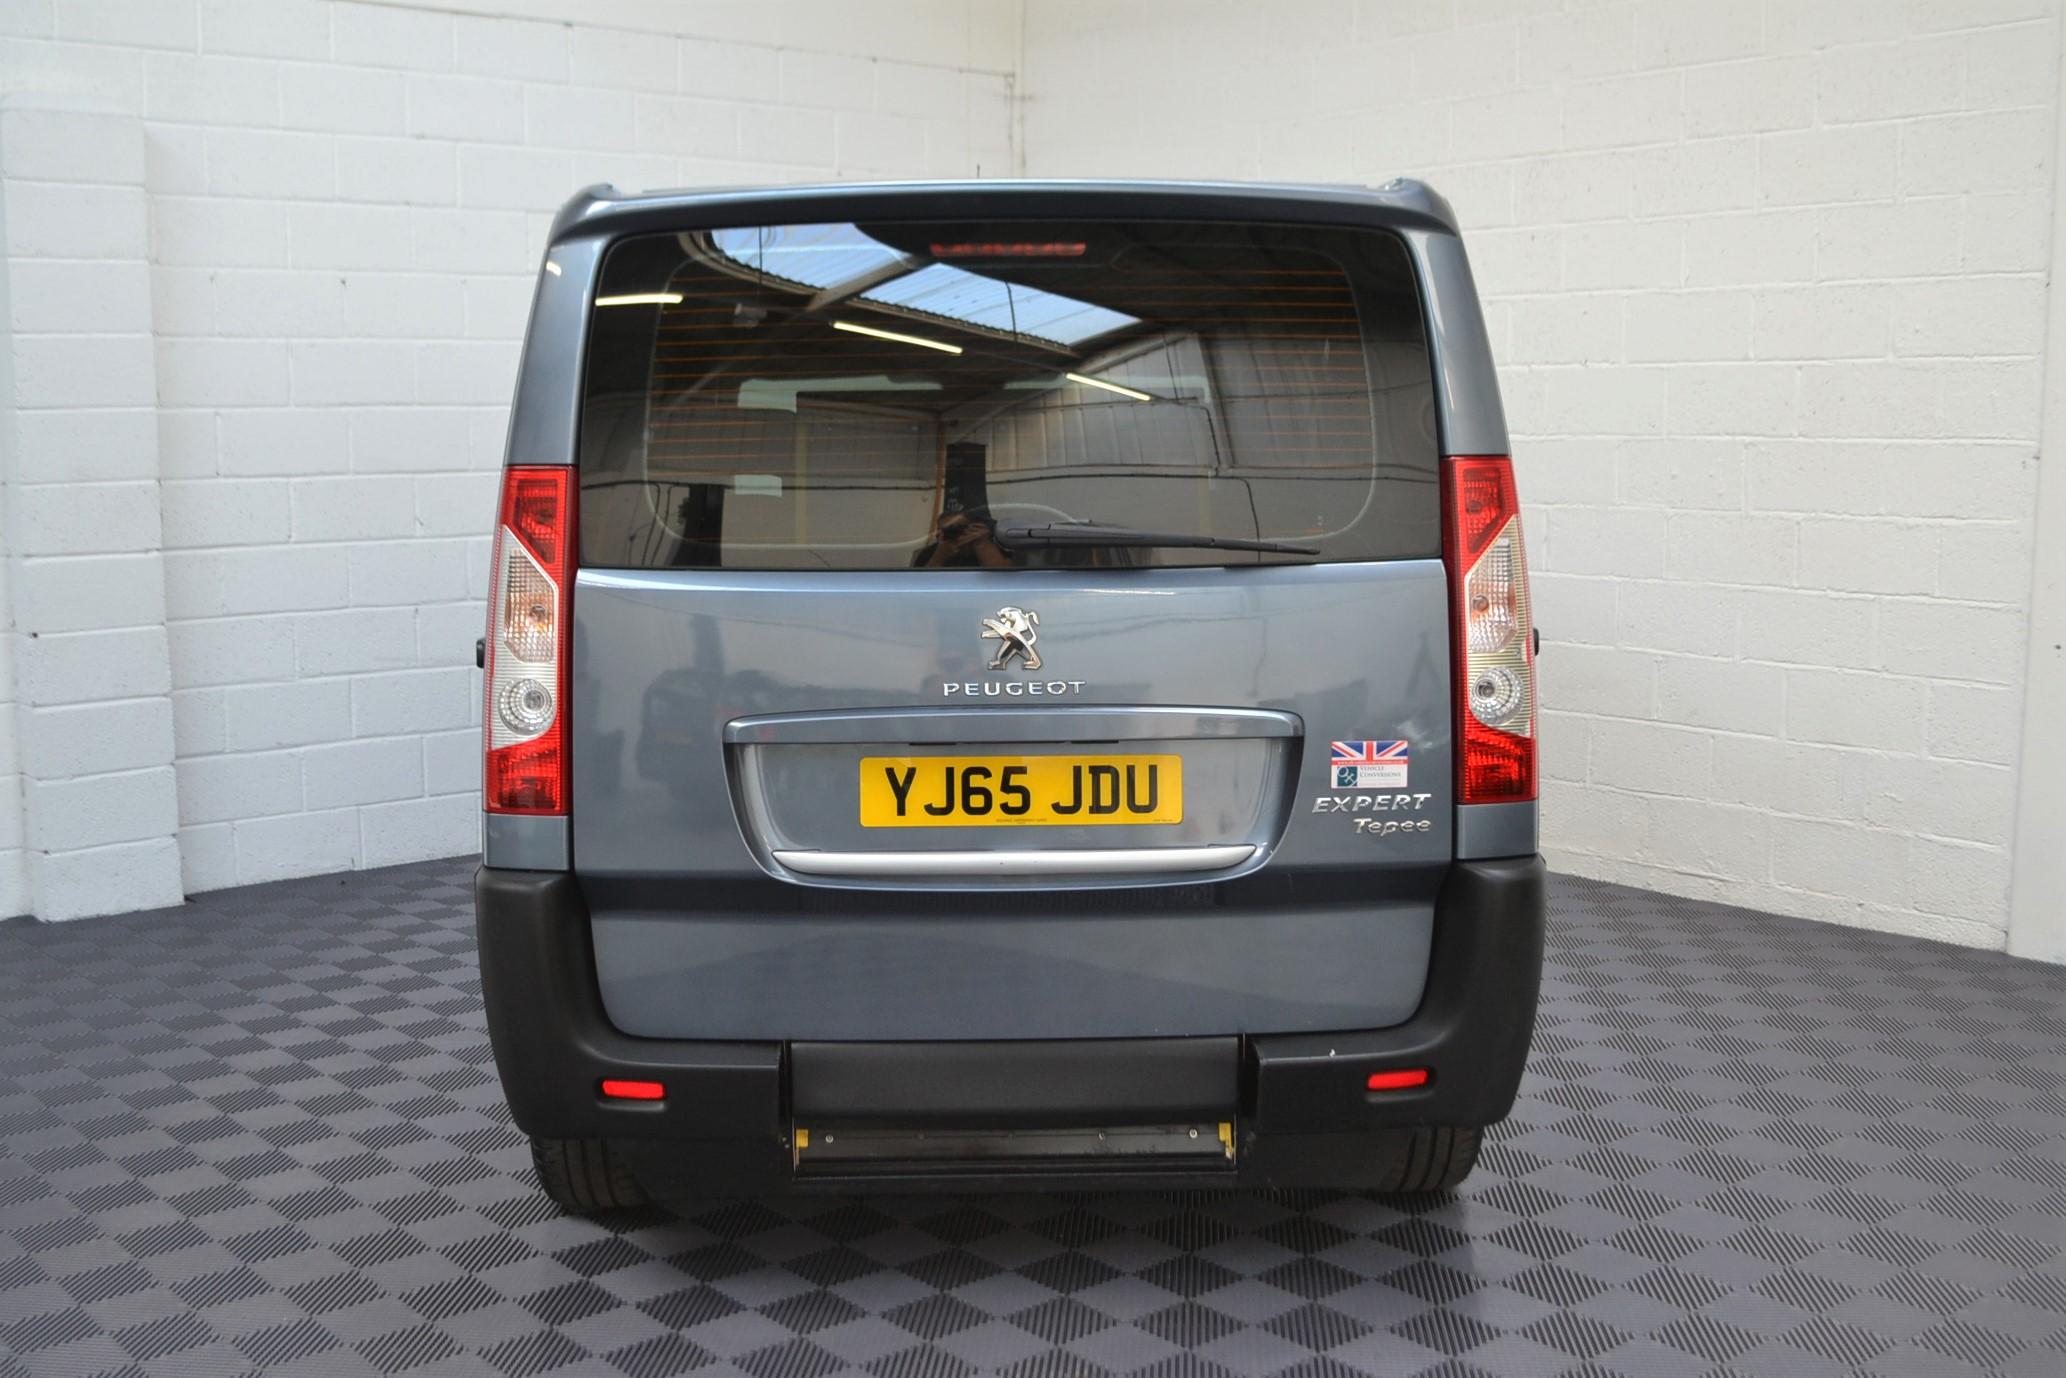 WAV Cars For Sale Bristol Wheelchair Accessible Vehicles Used For Sale Somerset Devon Dorset Bath Peugeot Expert YJ65 JDU 4